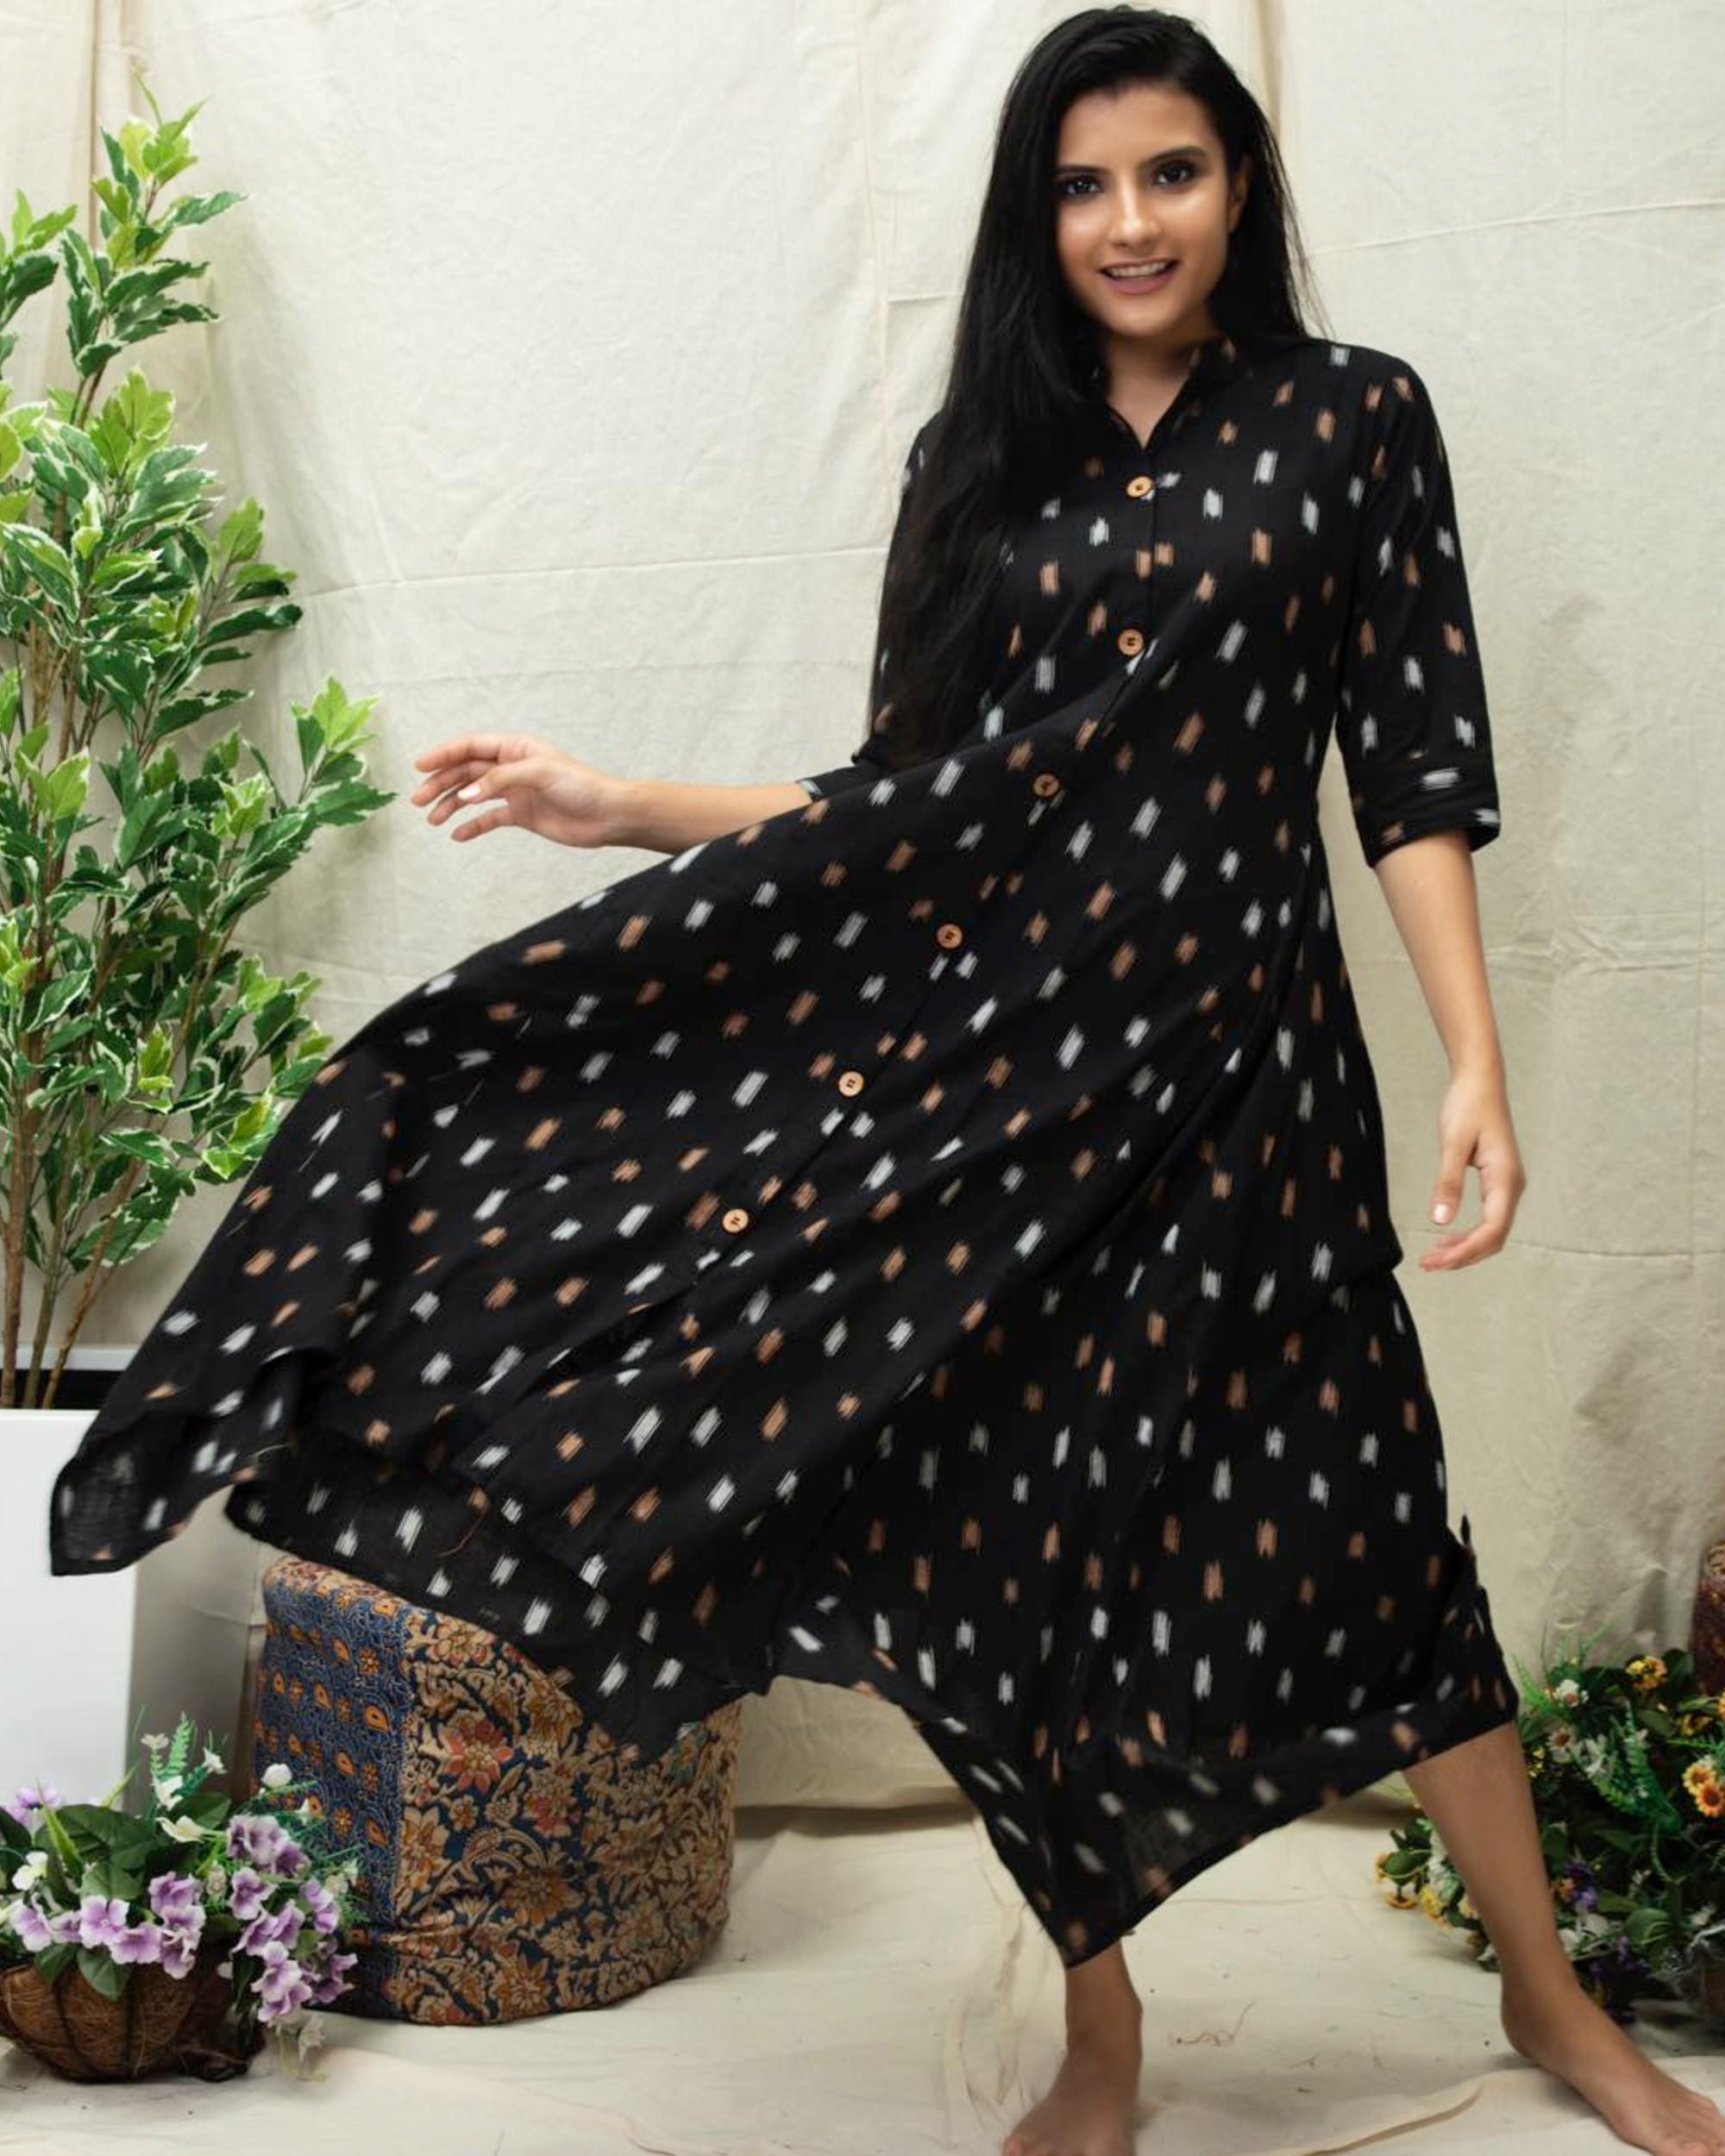 Black tail cut Ikat printed kurta